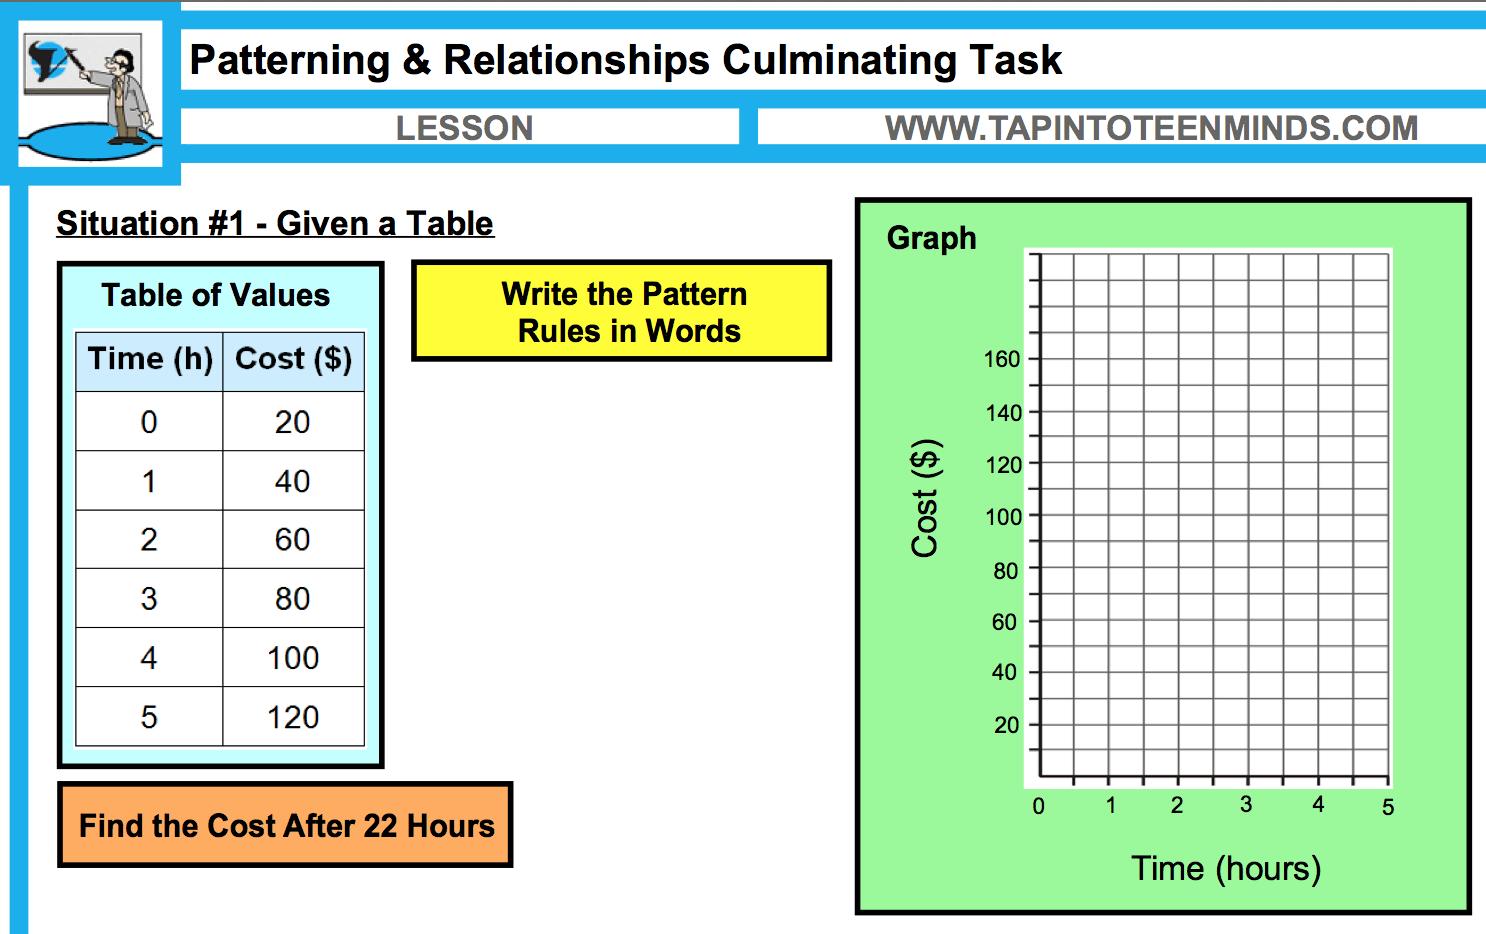 patterns and relationships culminating task grade 6 mathematics. Black Bedroom Furniture Sets. Home Design Ideas